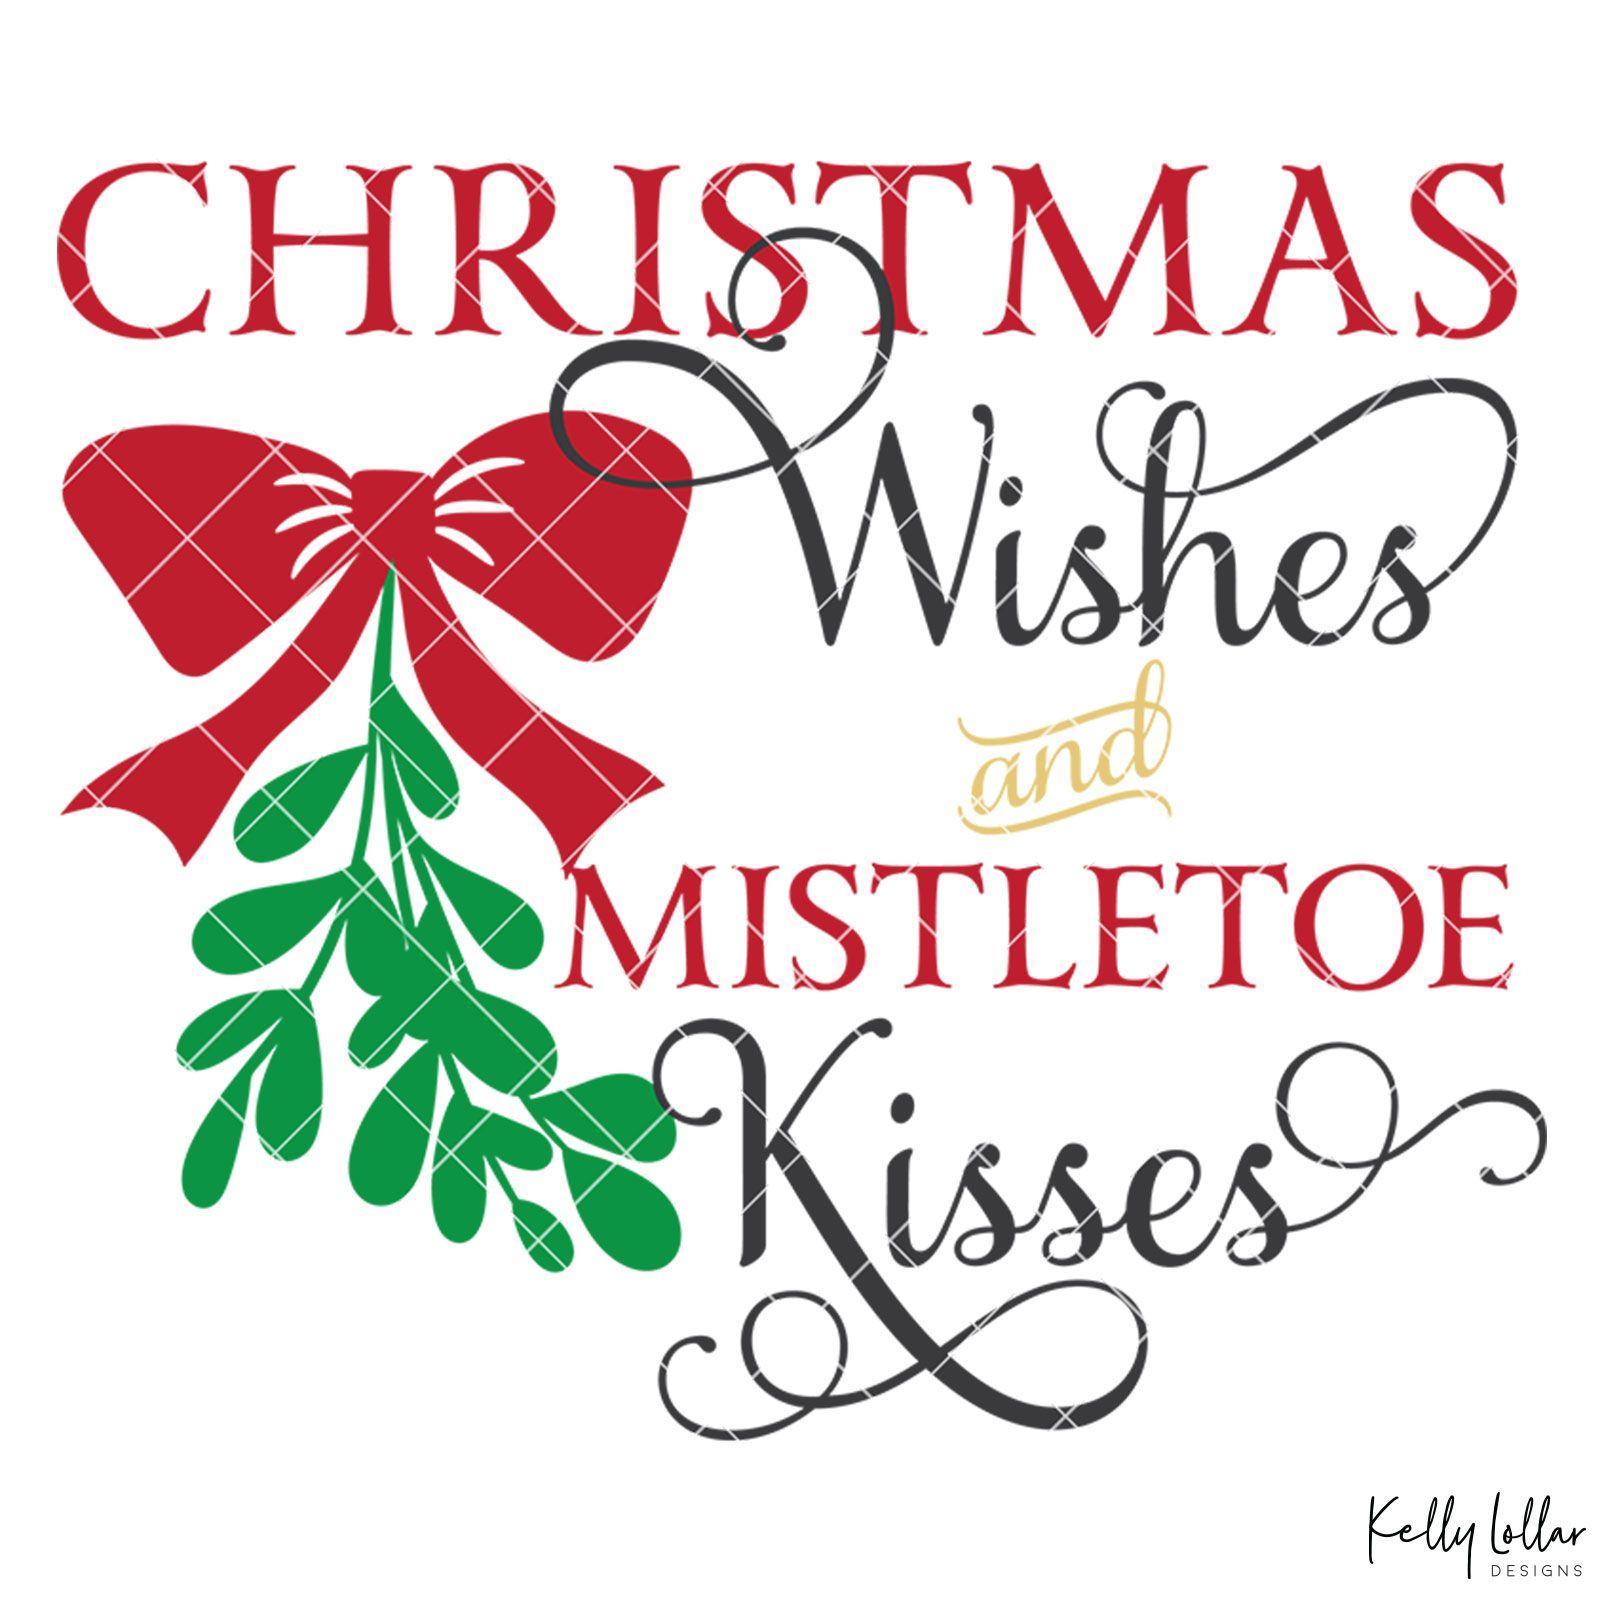 Christmas Wishes and Mistletoe Kisses - SoFontsy #mistletoesfootprintcraft